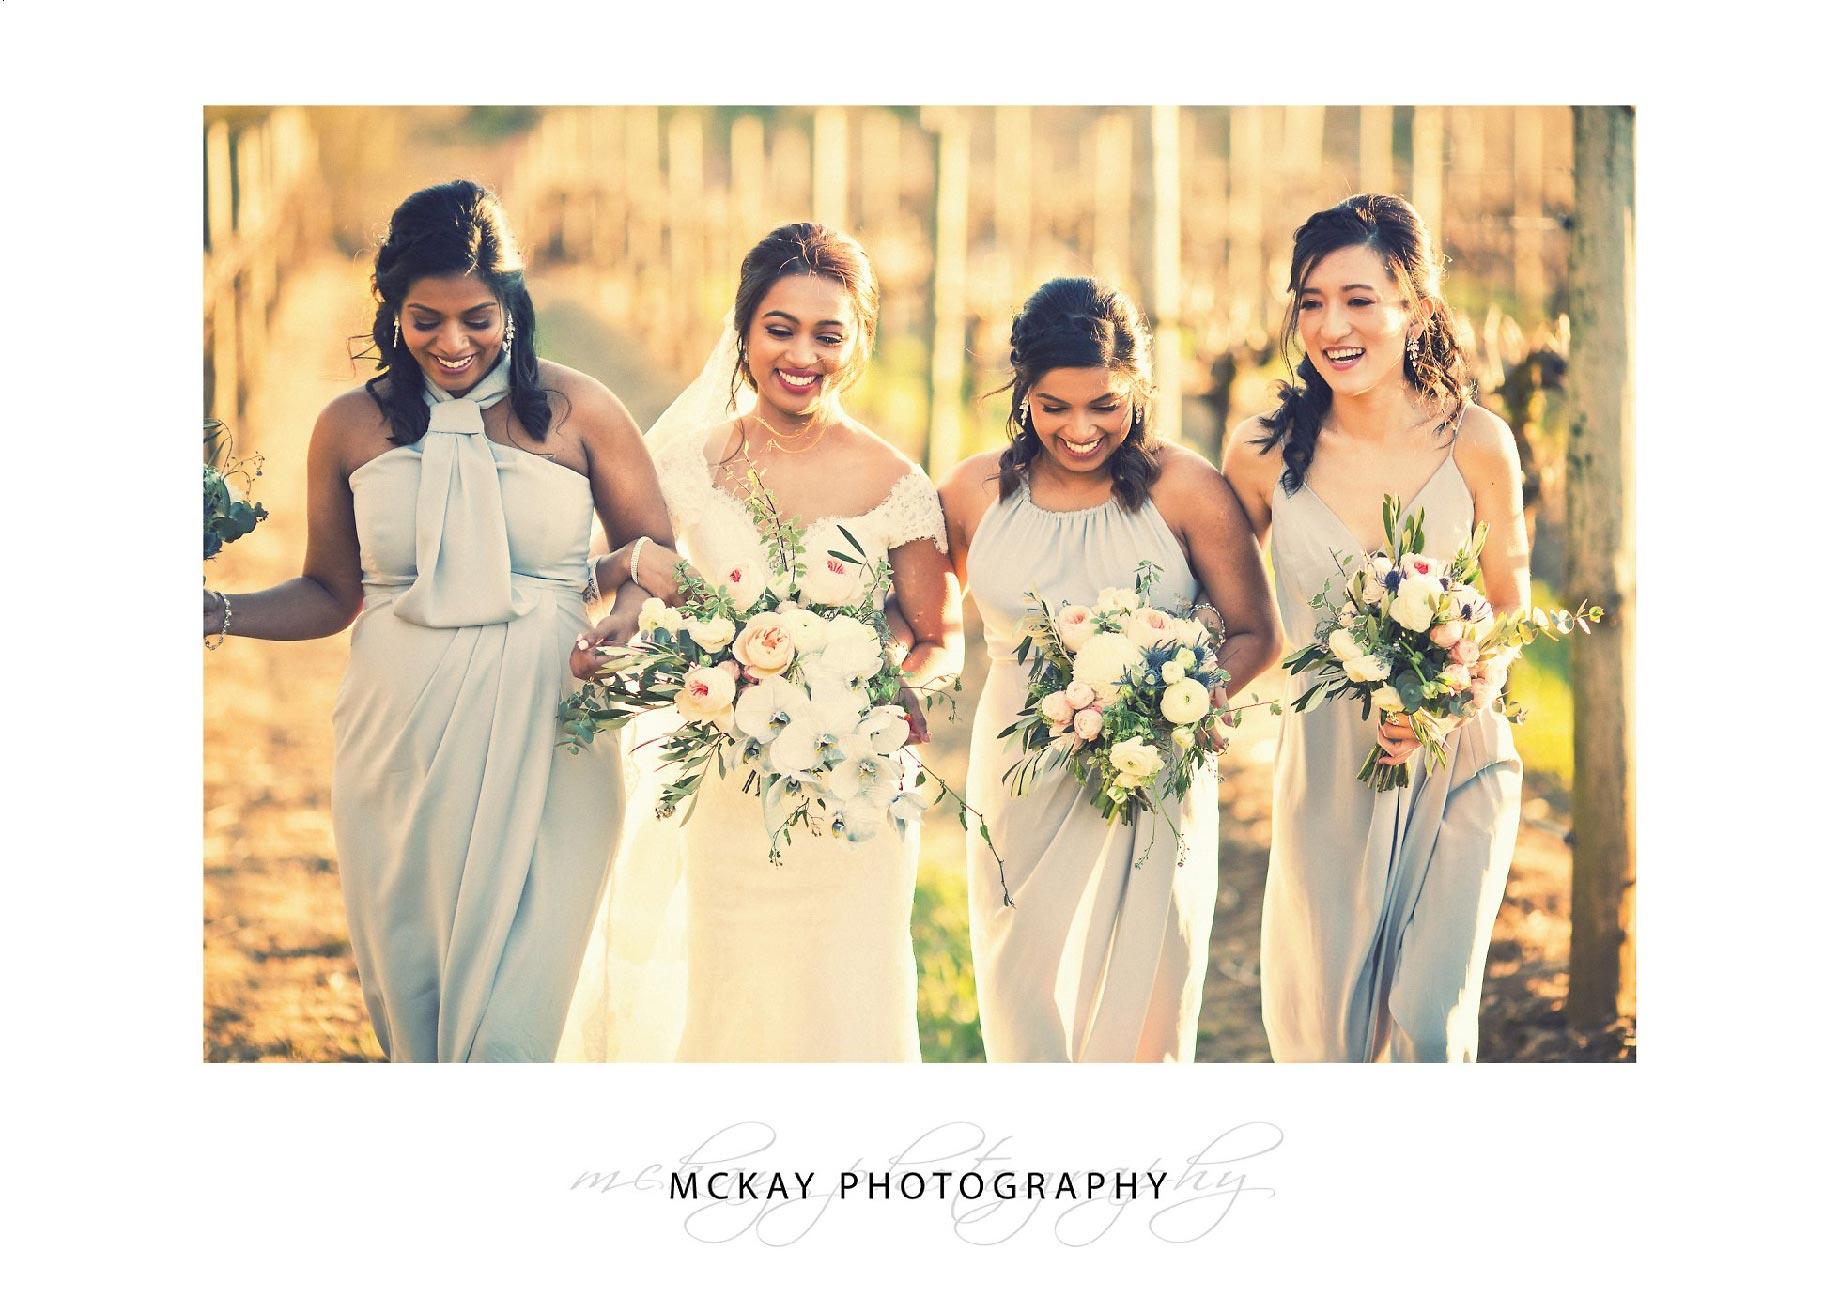 Ayoni & bridesmaids in the vineyards